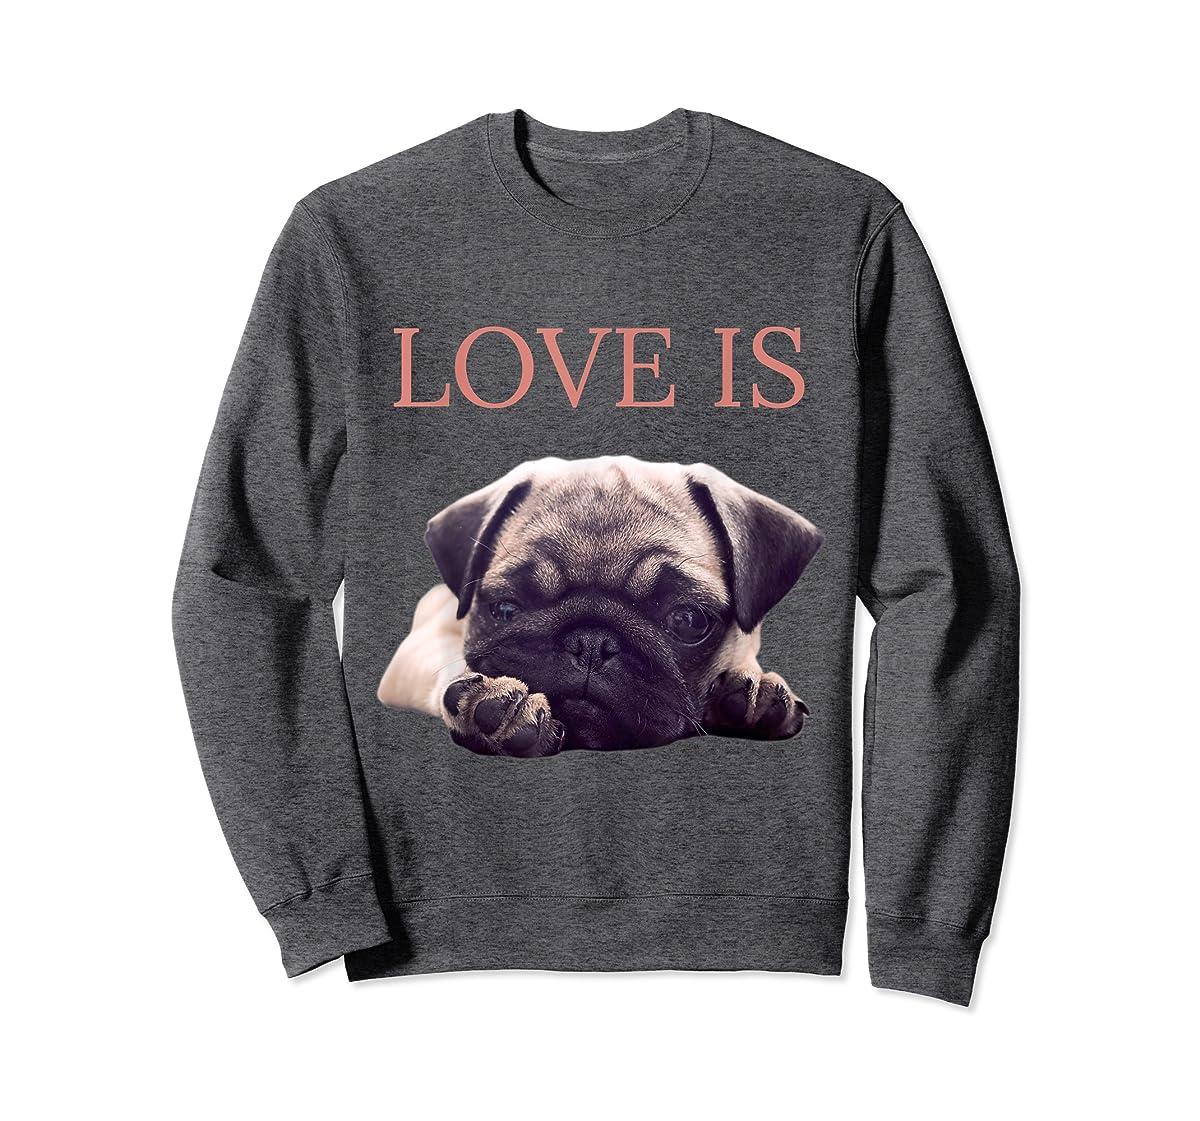 Mothers Day Pug Shirt Women Men Pug Mom Life Tee Love Is Dog-Sweatshirt-Dark Heather